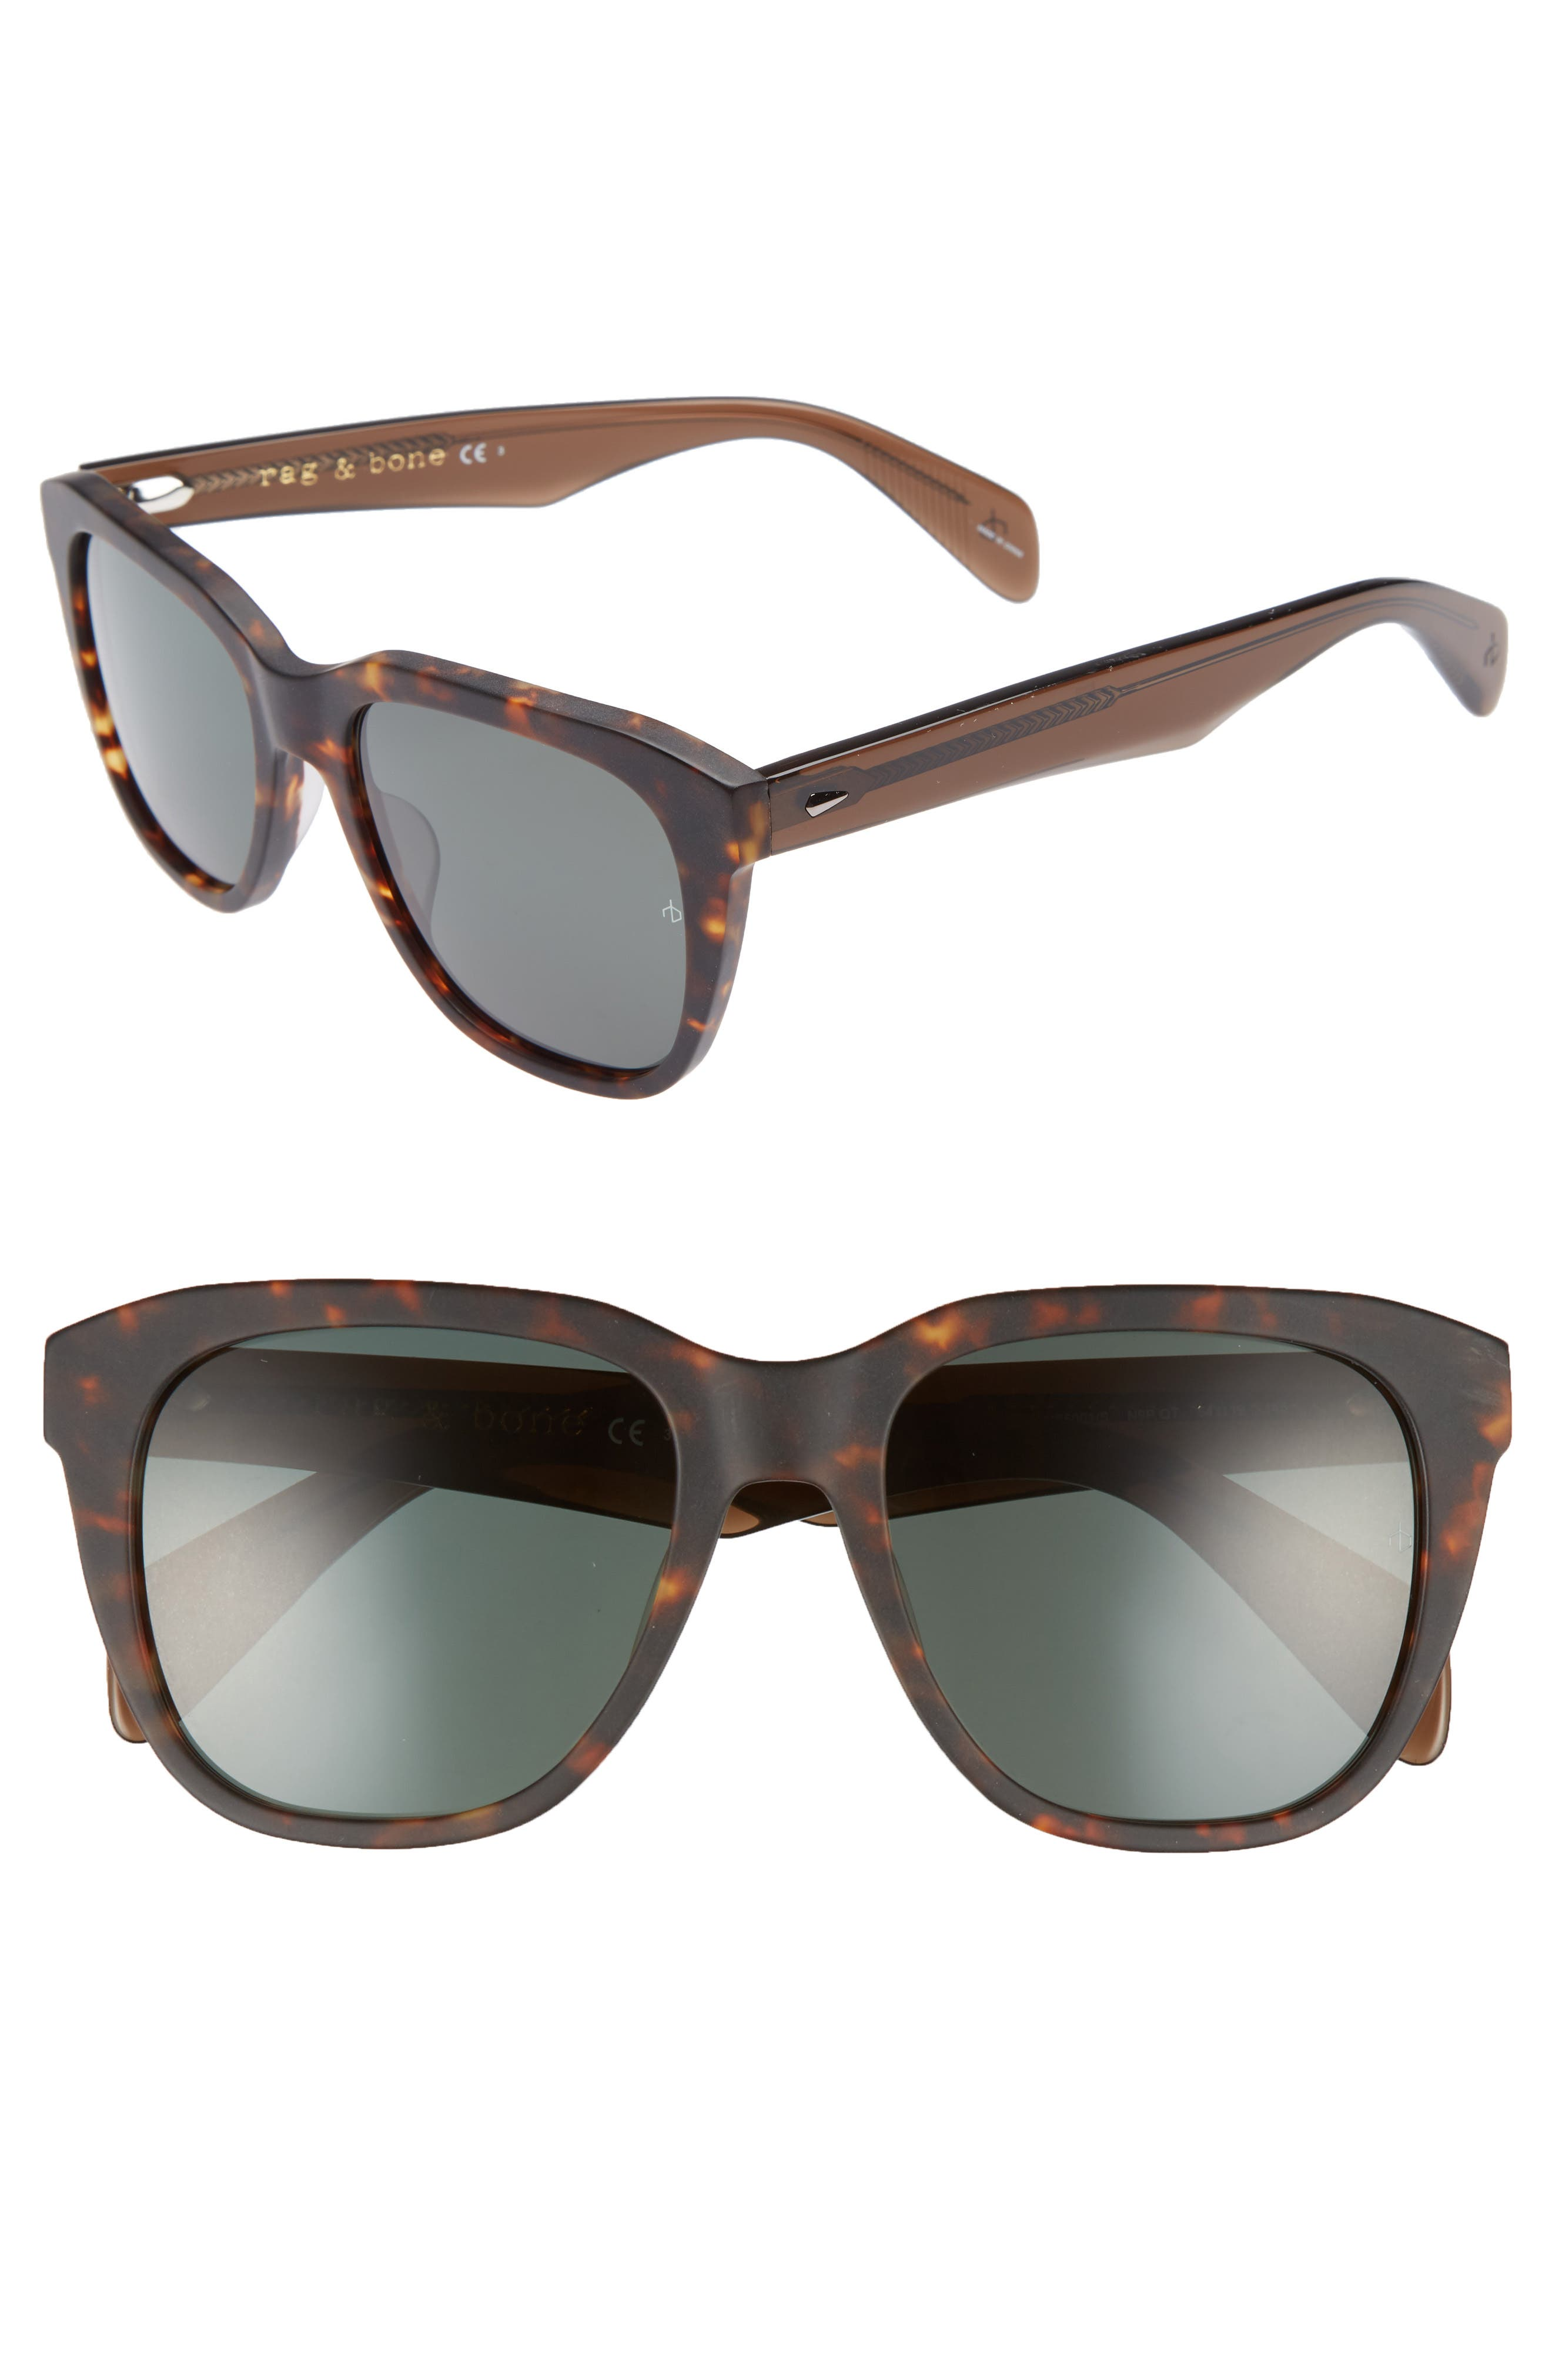 RAG & BONE,                             54mm Sunglasses,                             Main thumbnail 1, color,                             210